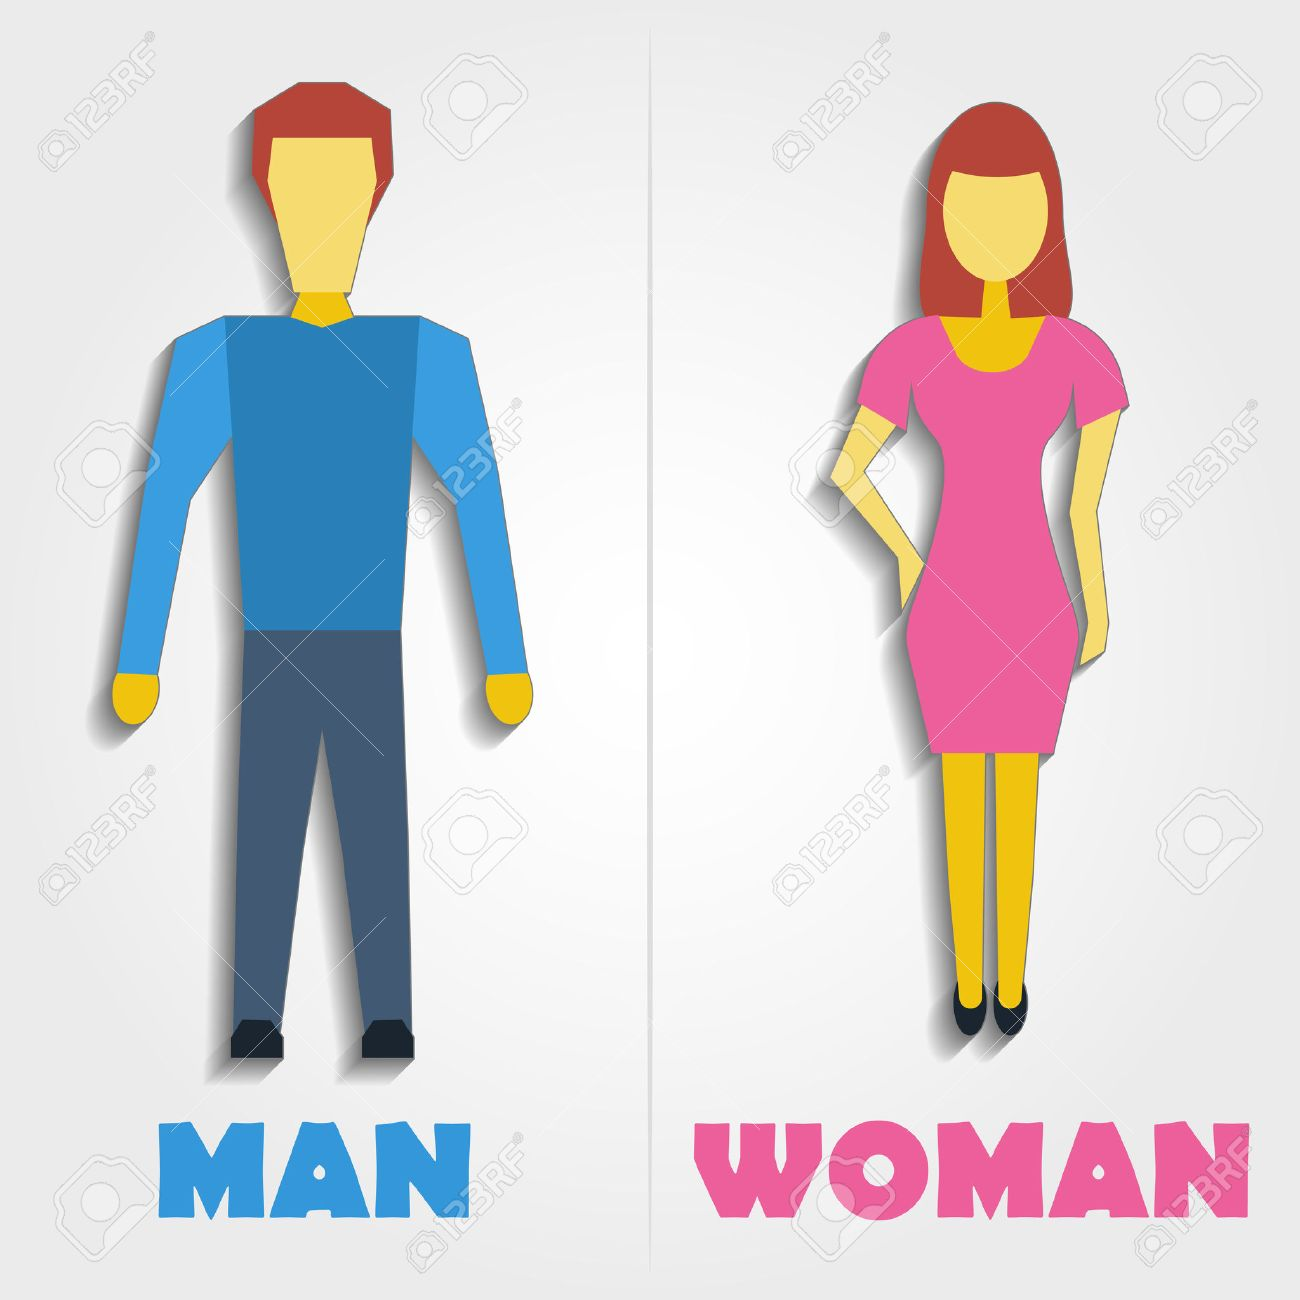 Universal restroom symbol stock photos royalty free universal male and female restroom symbol icon with blend shadows illustration buycottarizona